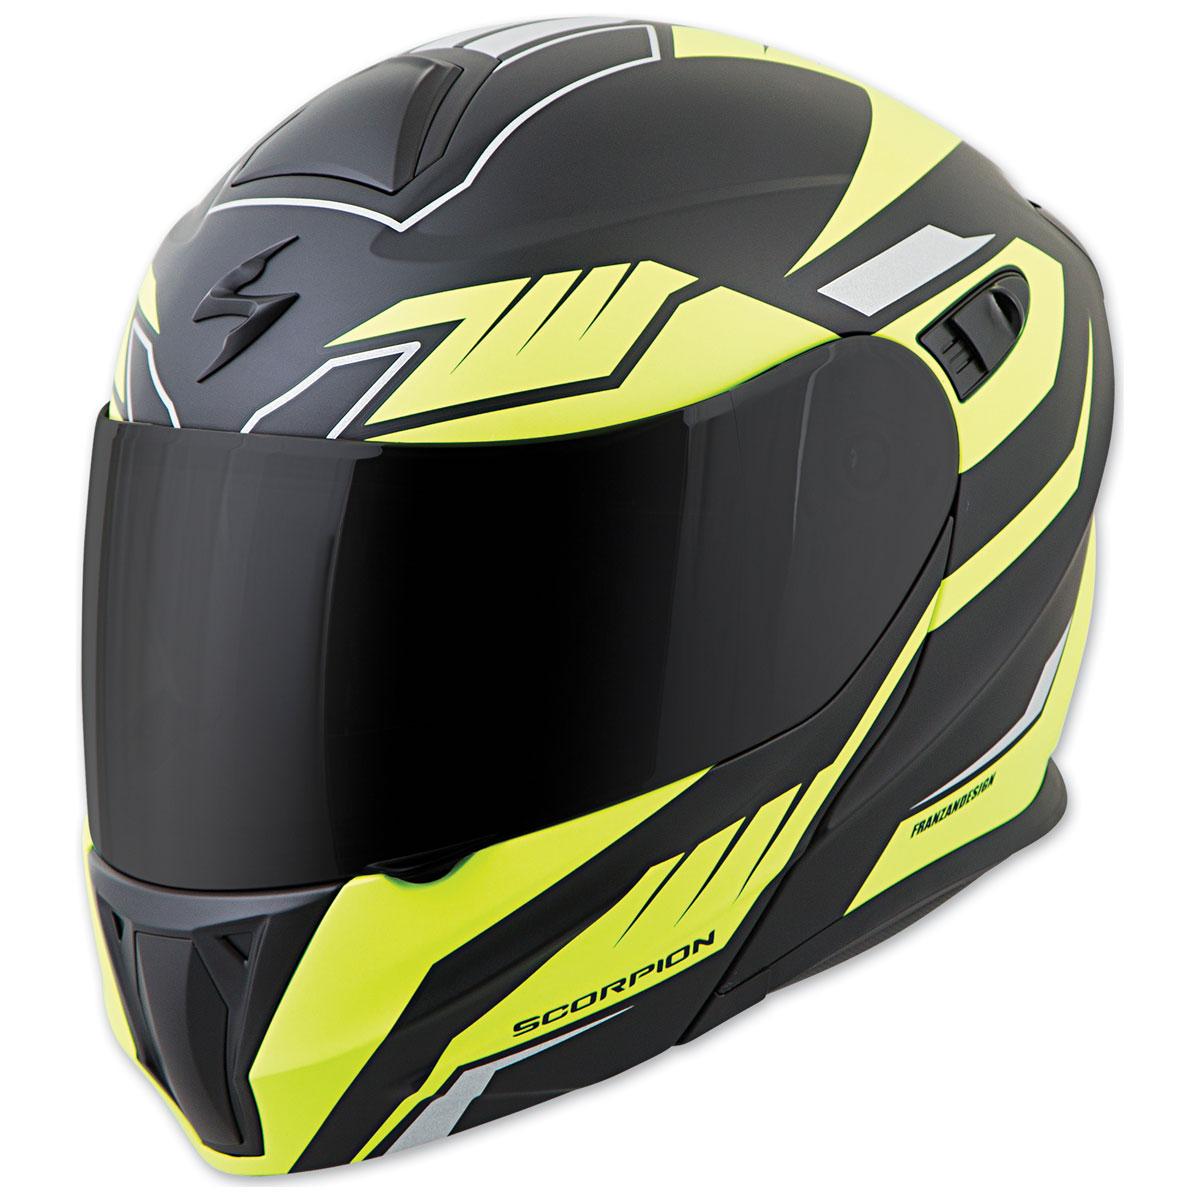 Scorpion EXO EXO-GT920 Shuttle Neon Modular Helmet